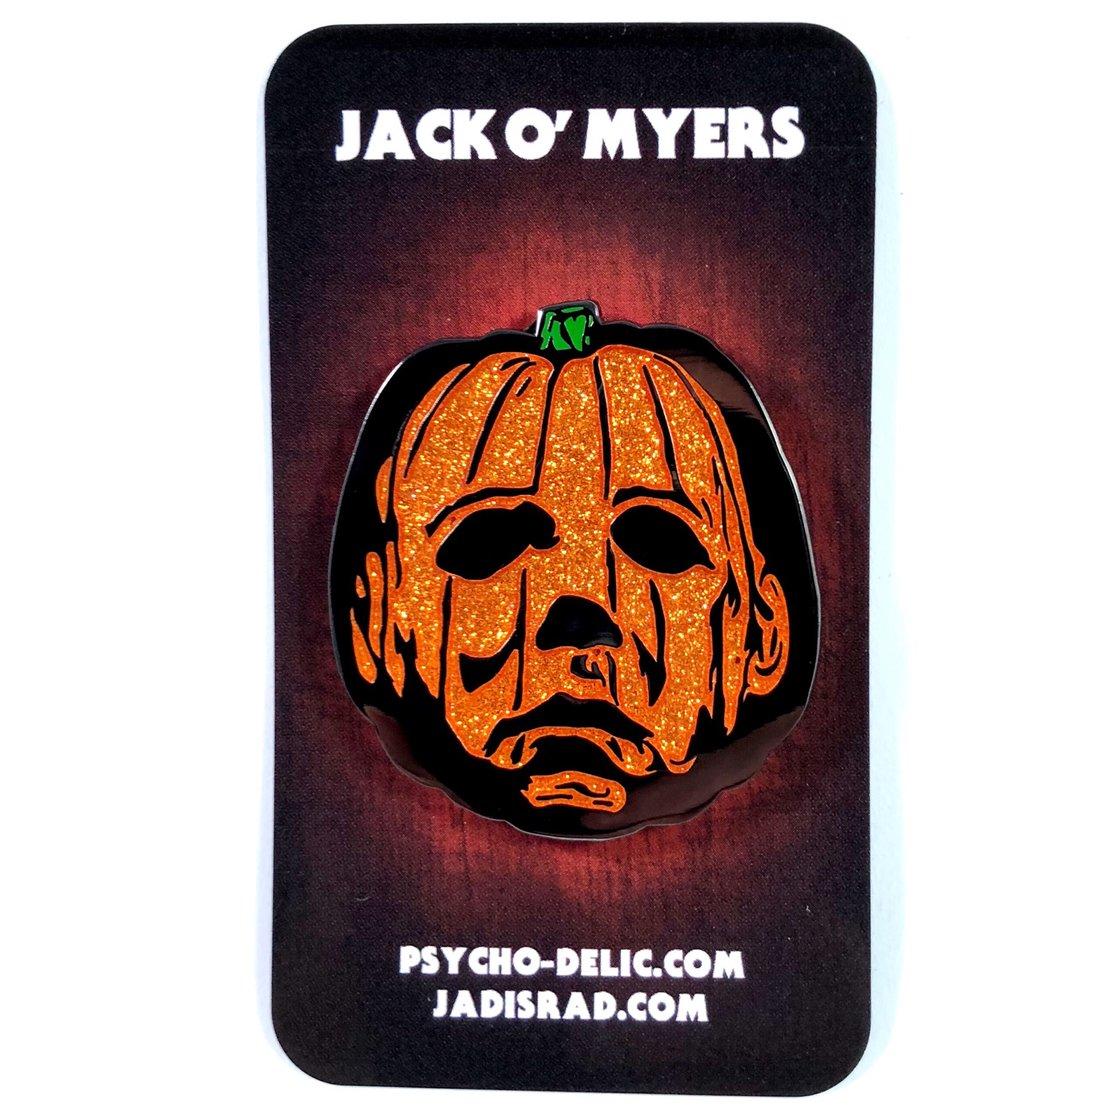 Image of Jack O' Myers Version 3 (Glitter) Pin